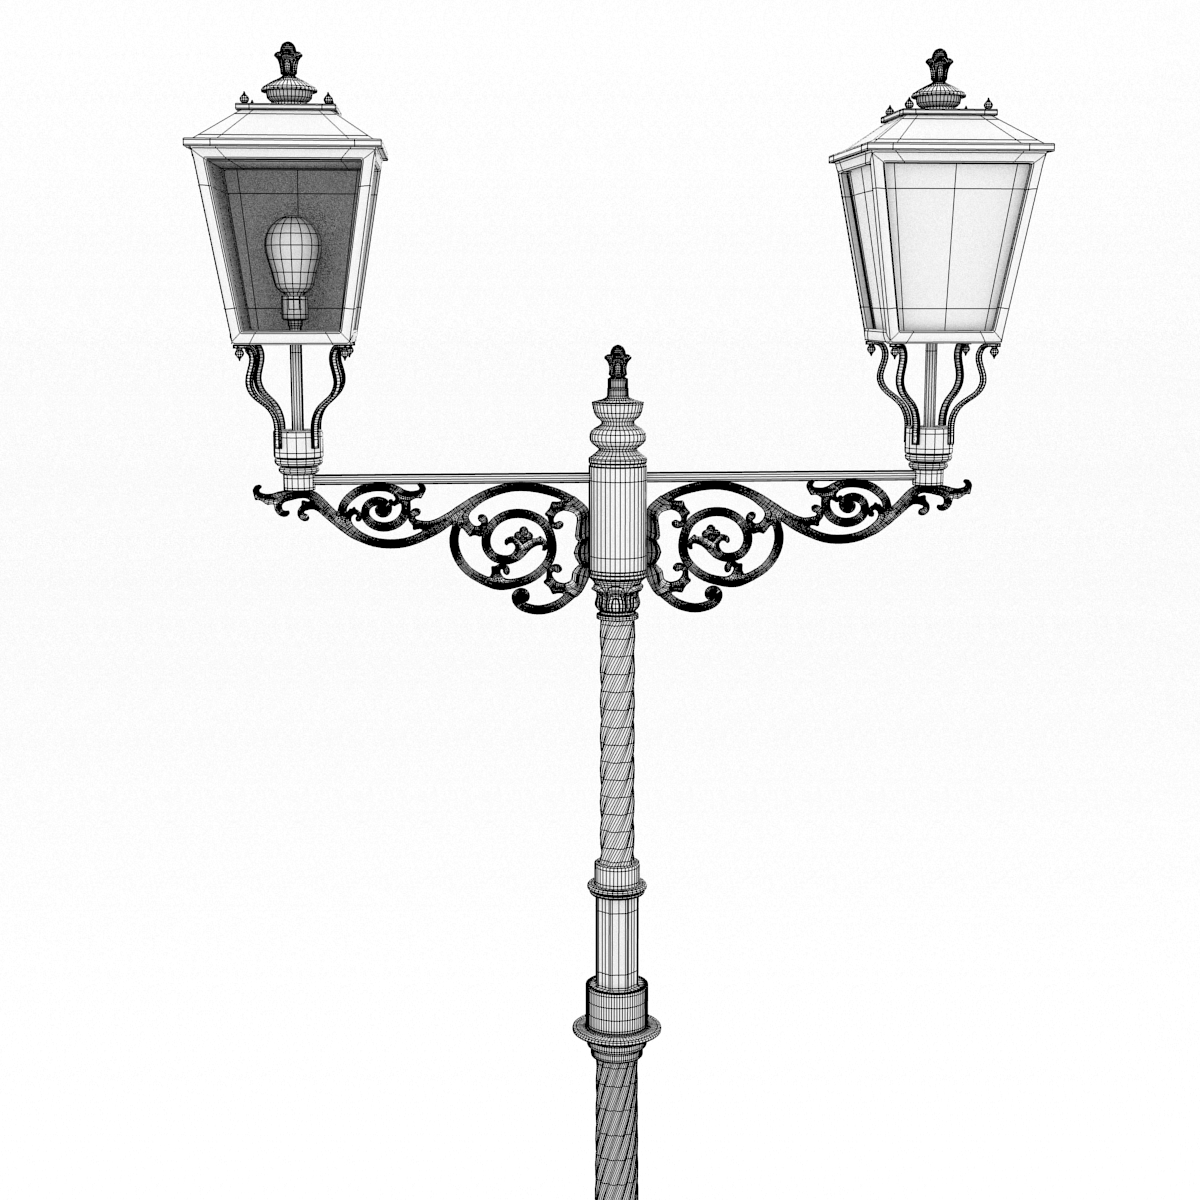 Cast Iron Street Lamp 3d Model